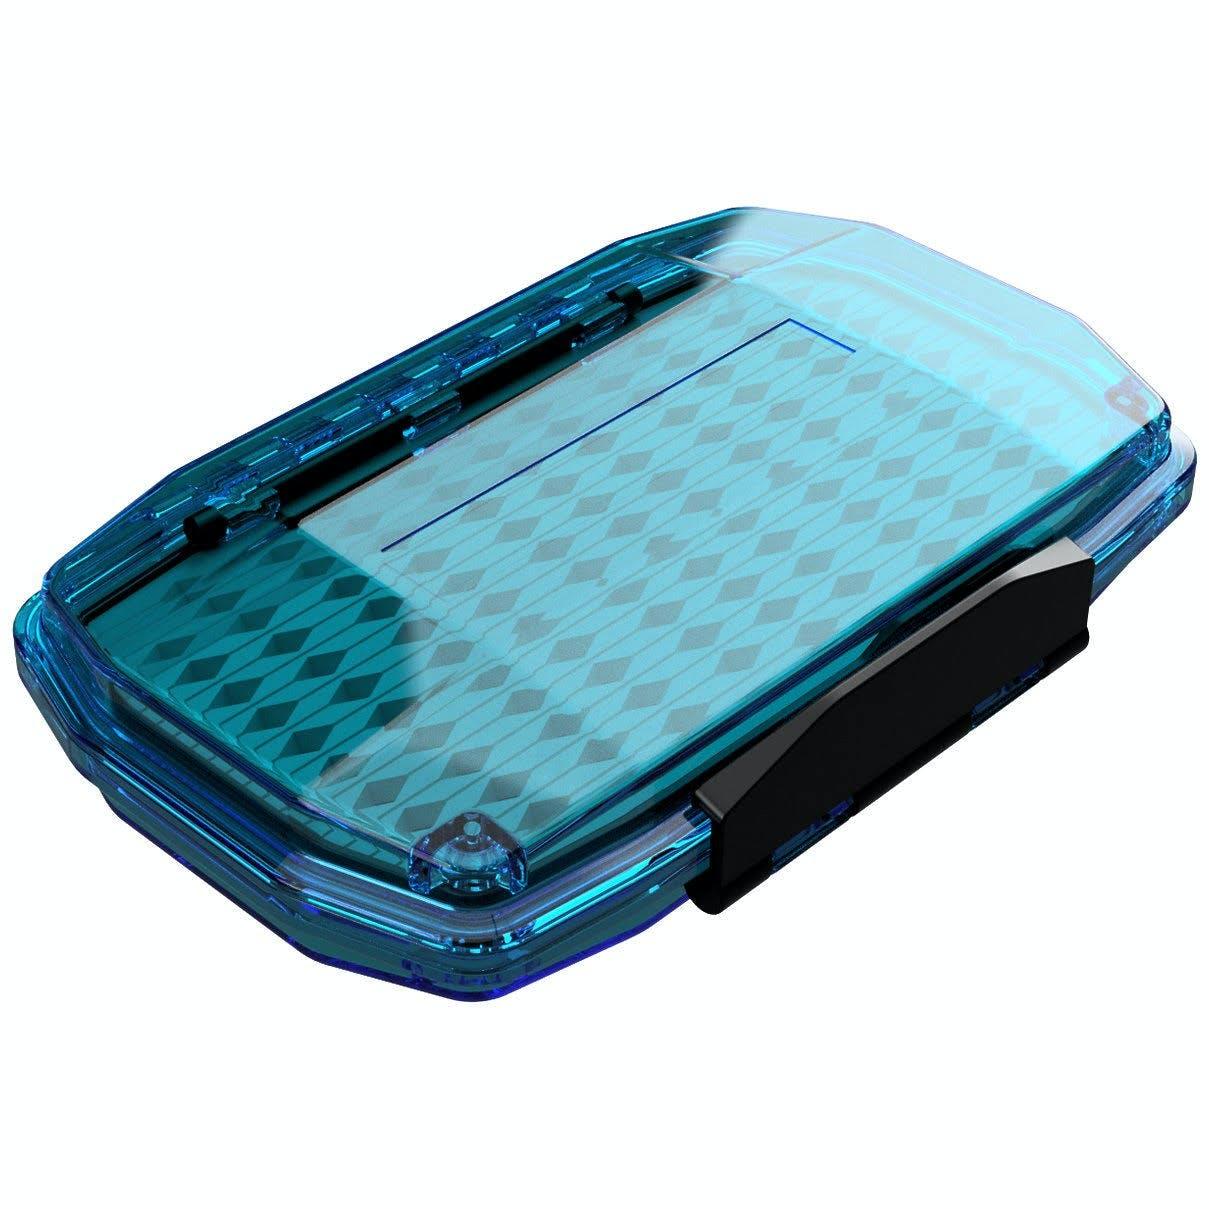 Umpqua UPG LT Fly Box: Standard; Blue